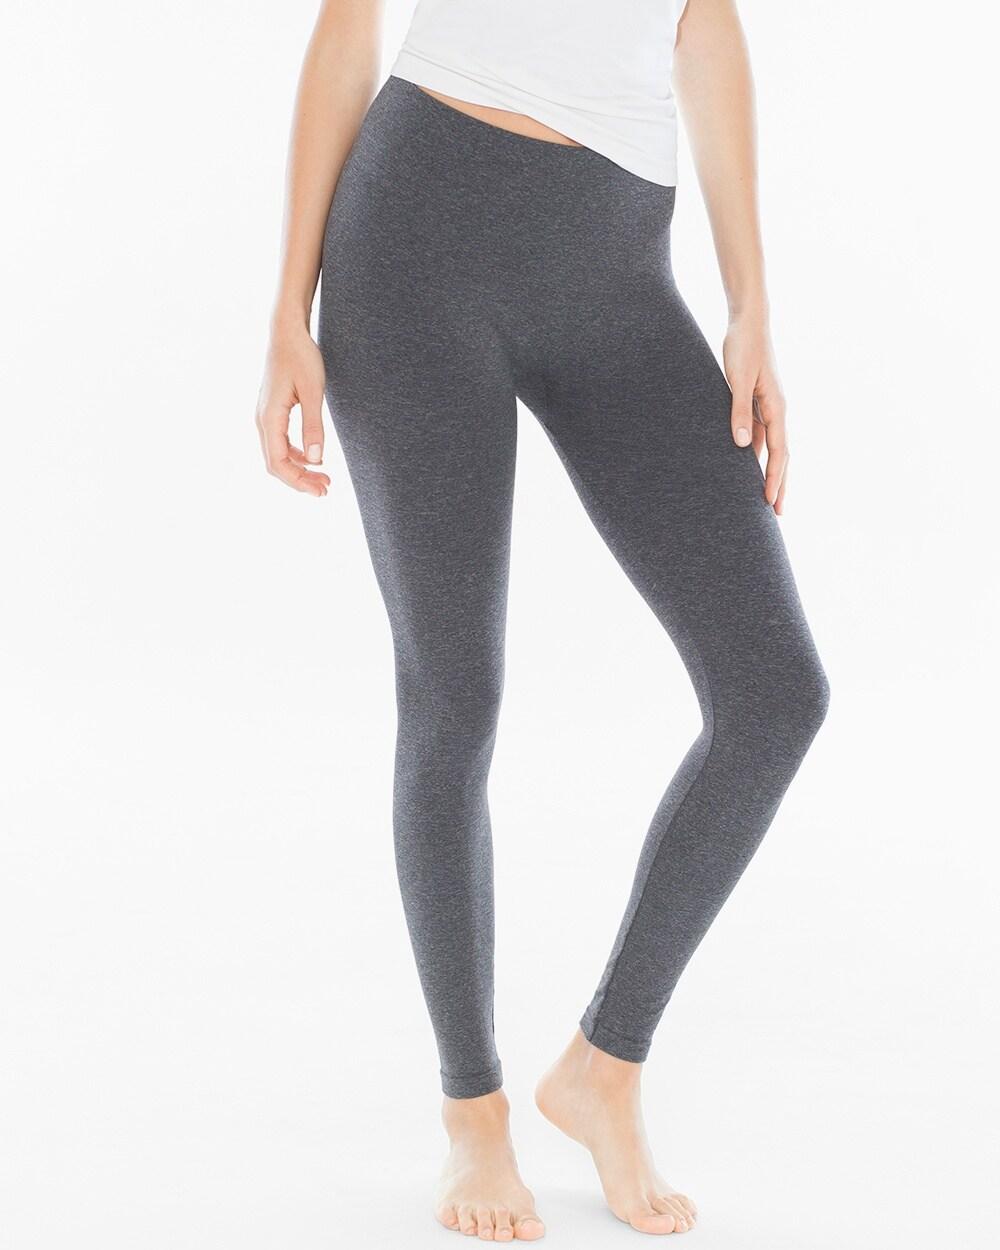 898922d6b63a6 Slimming Legging Heather Quartz - Soma